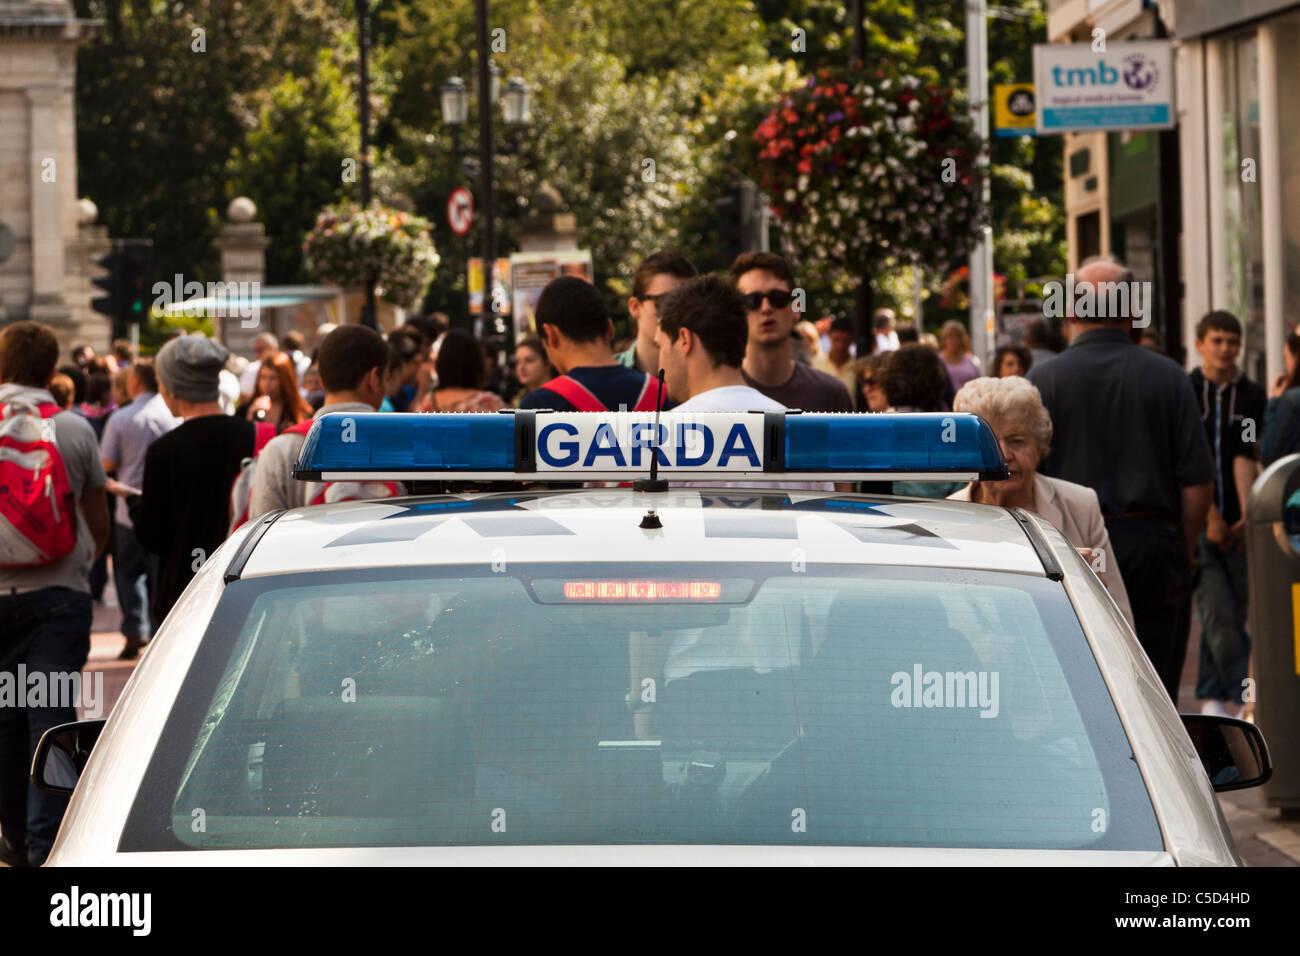 Garda Siochana car in Grafton Street, Dublin, Ireland Stock Photo